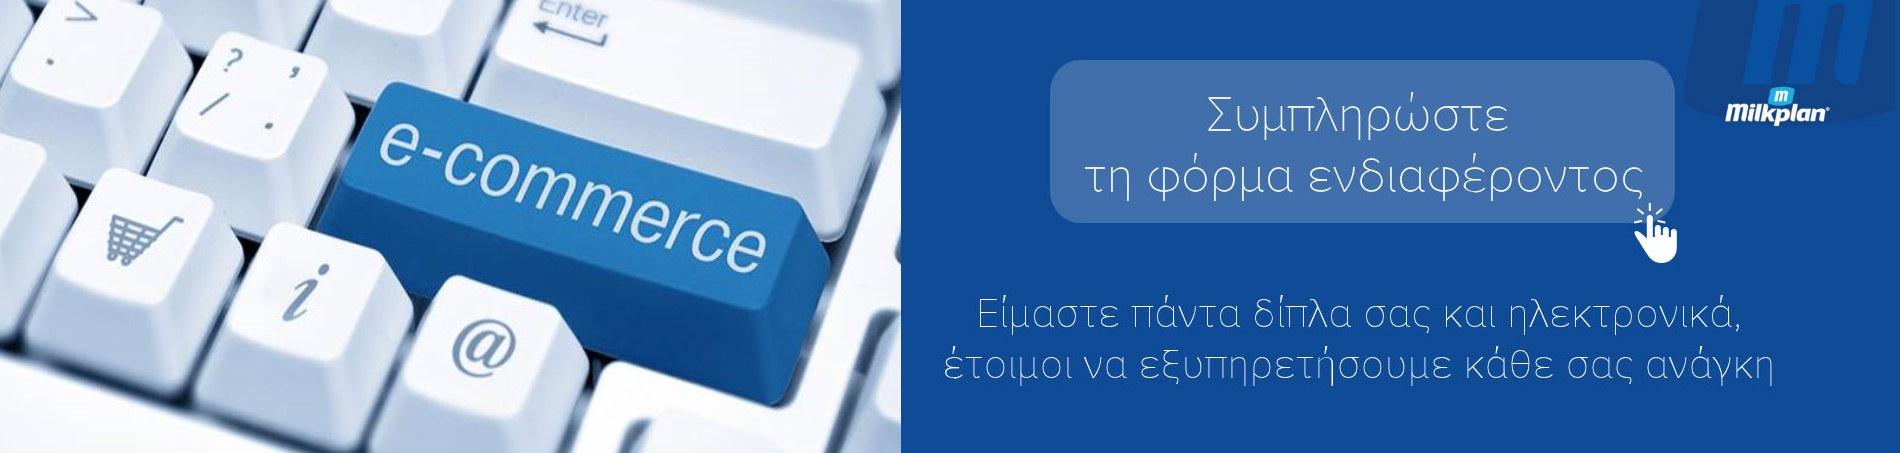 proforma_slide_n